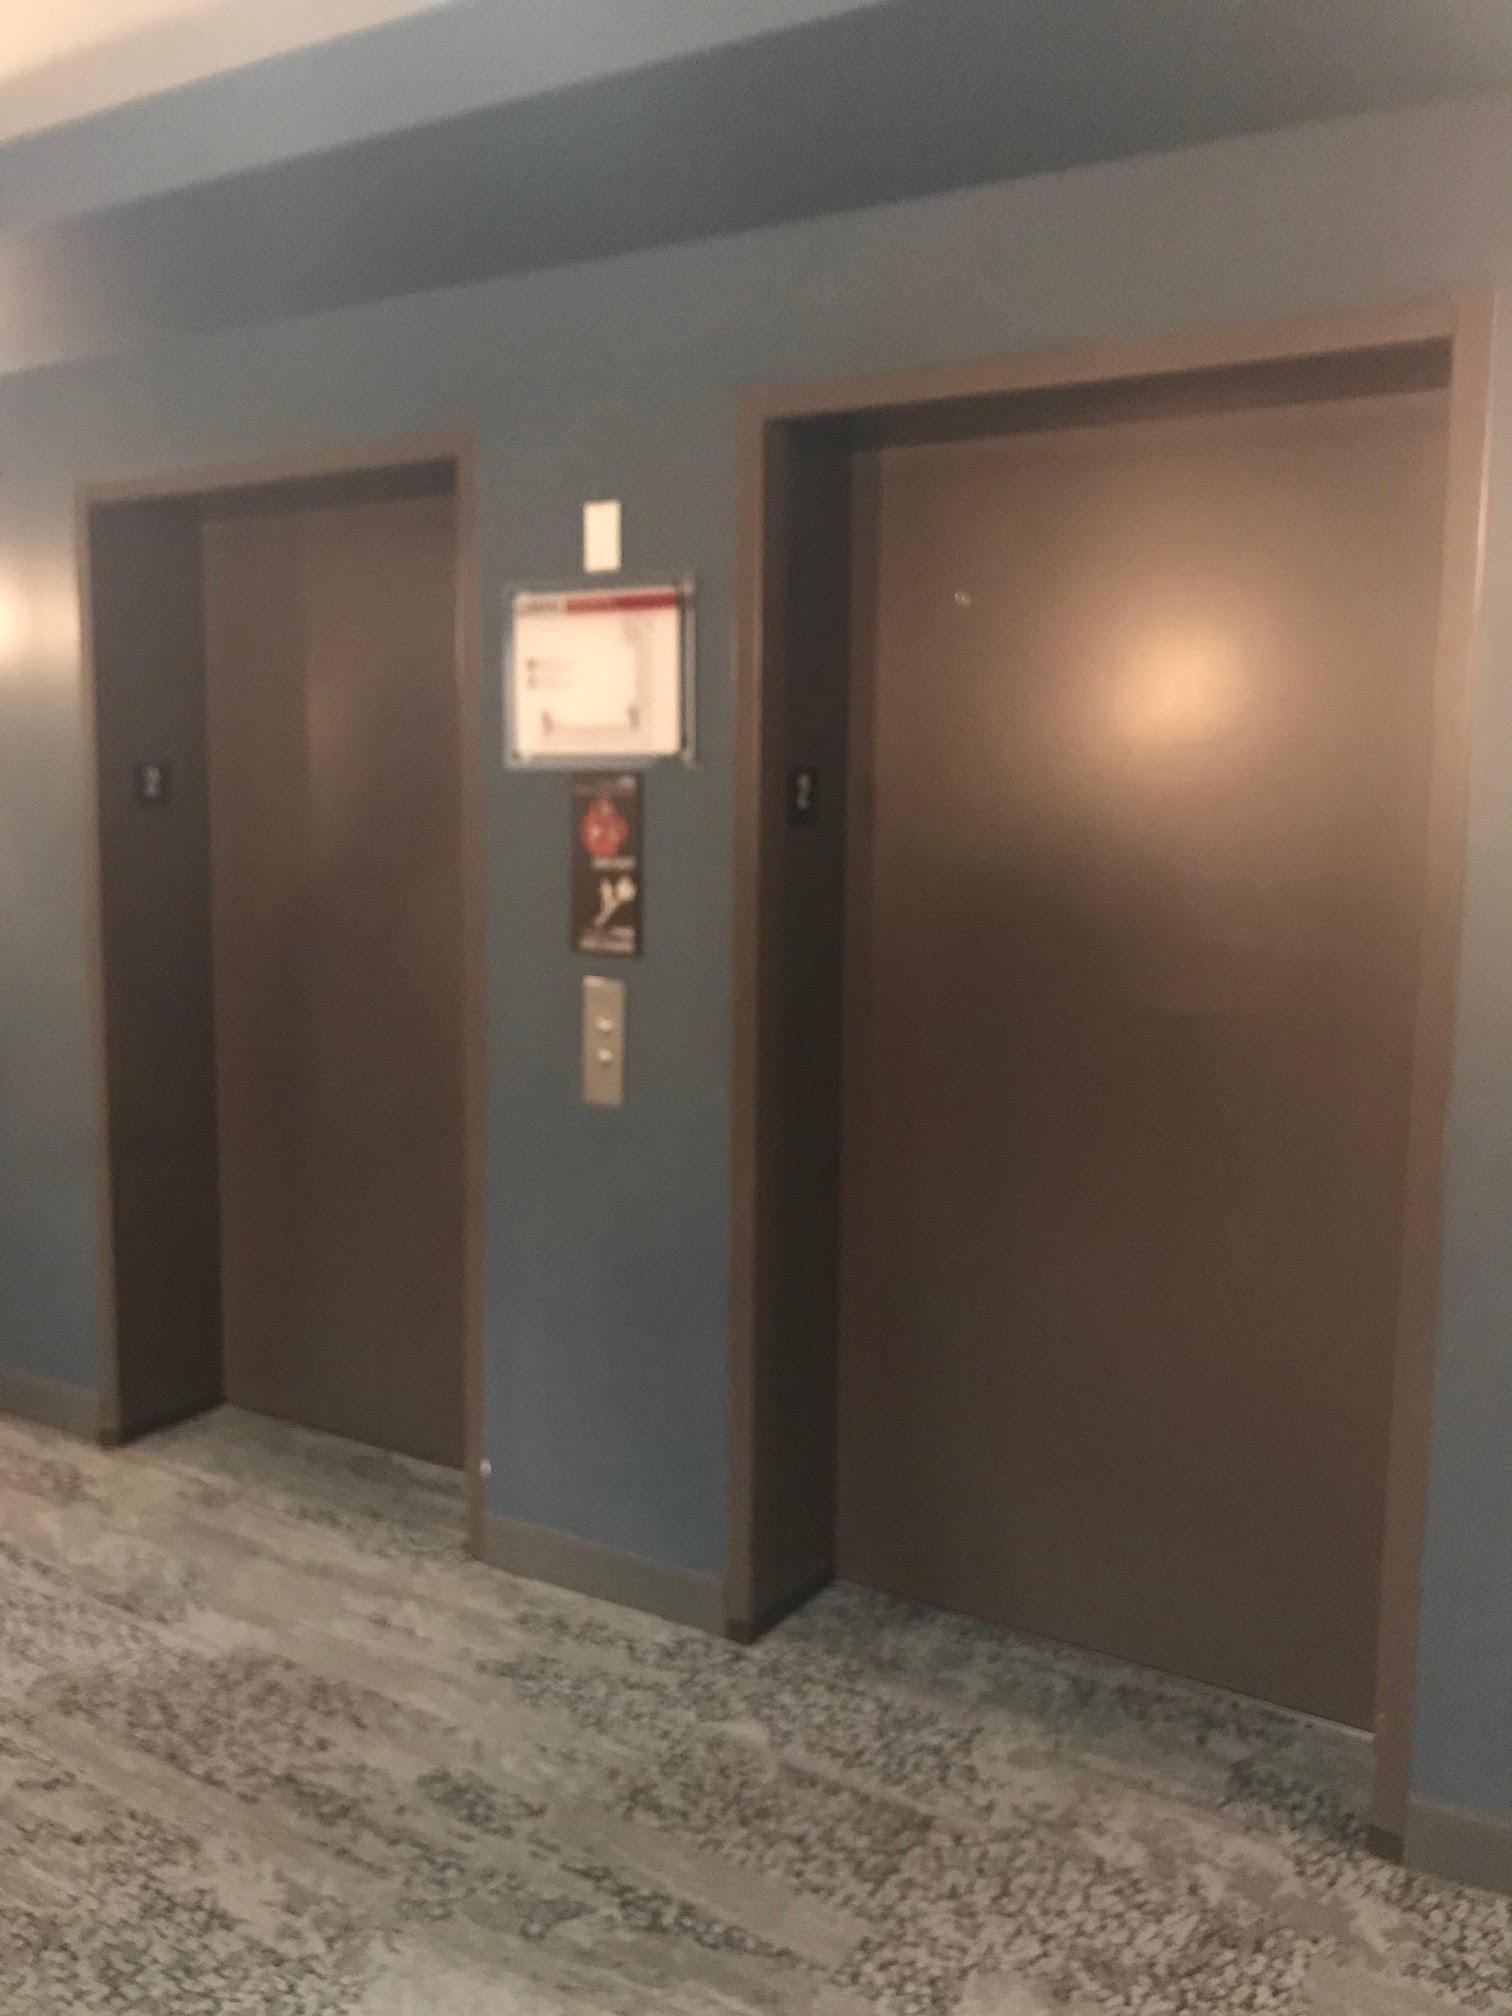 N elevators - lvl 2.jpg